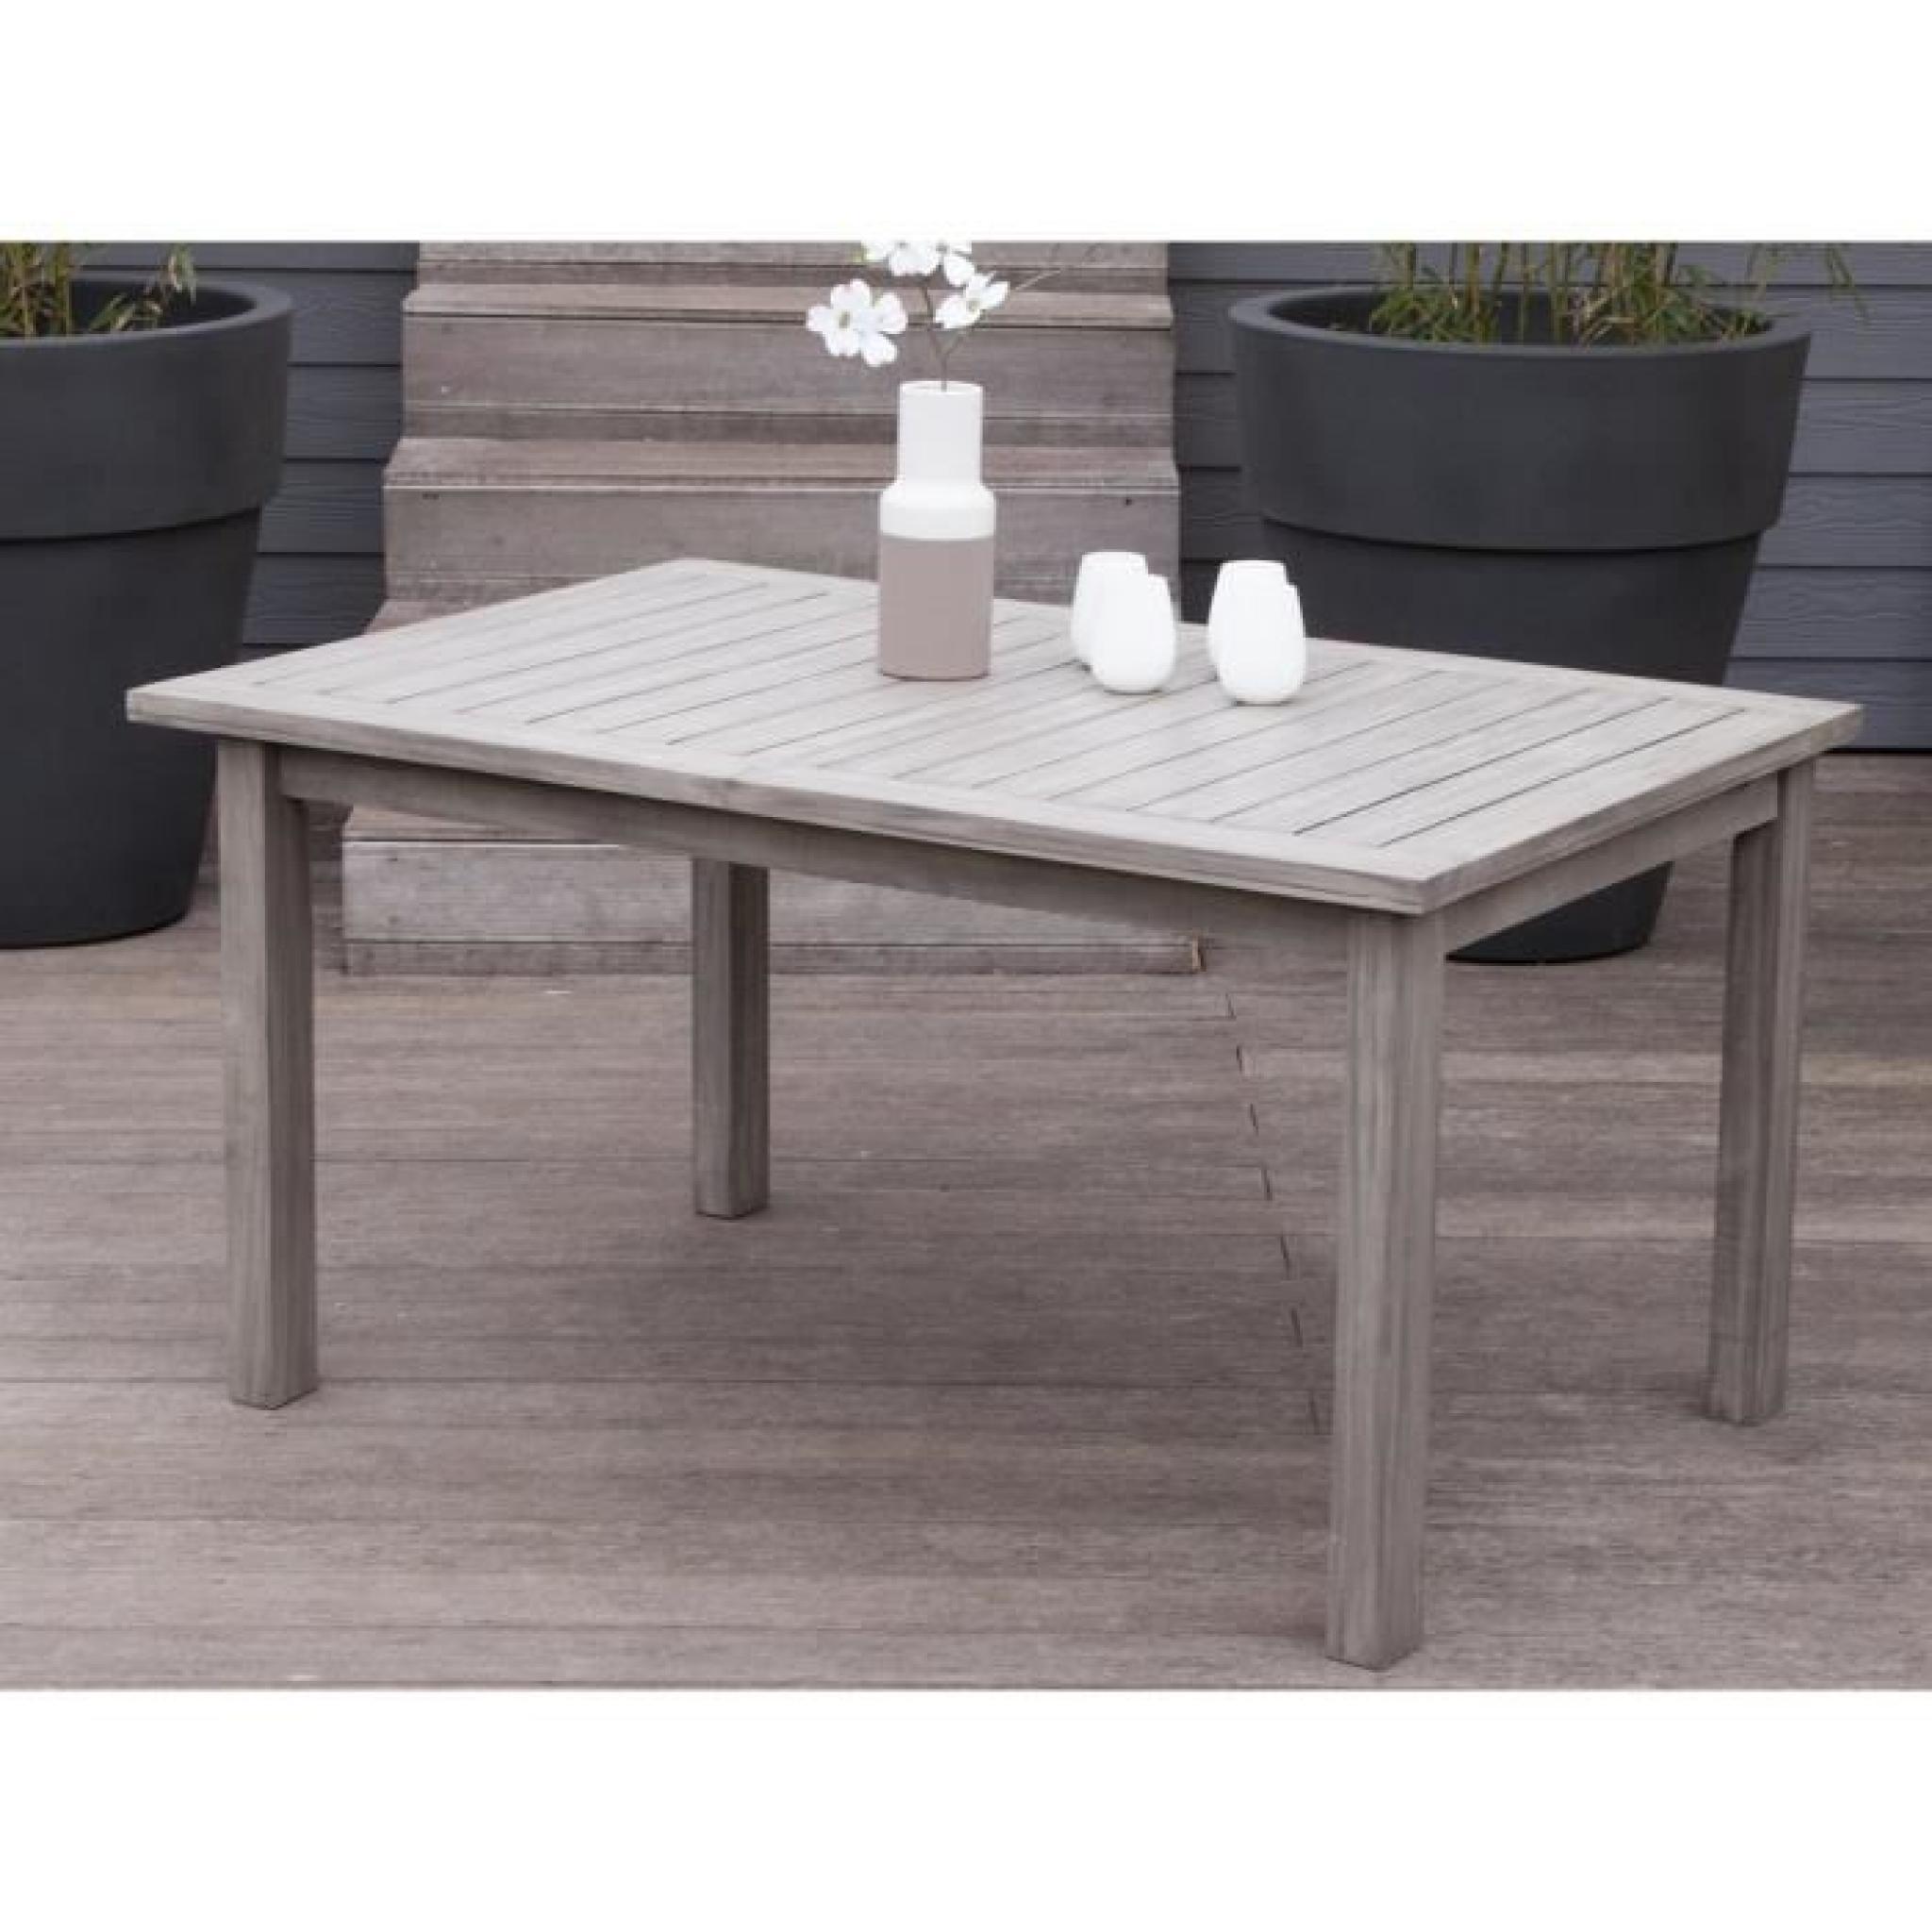 Table De Jardin Extensible En Acacia 150-200X100Cm Silverwood avec Table De Jardin Extensible Pas Cher